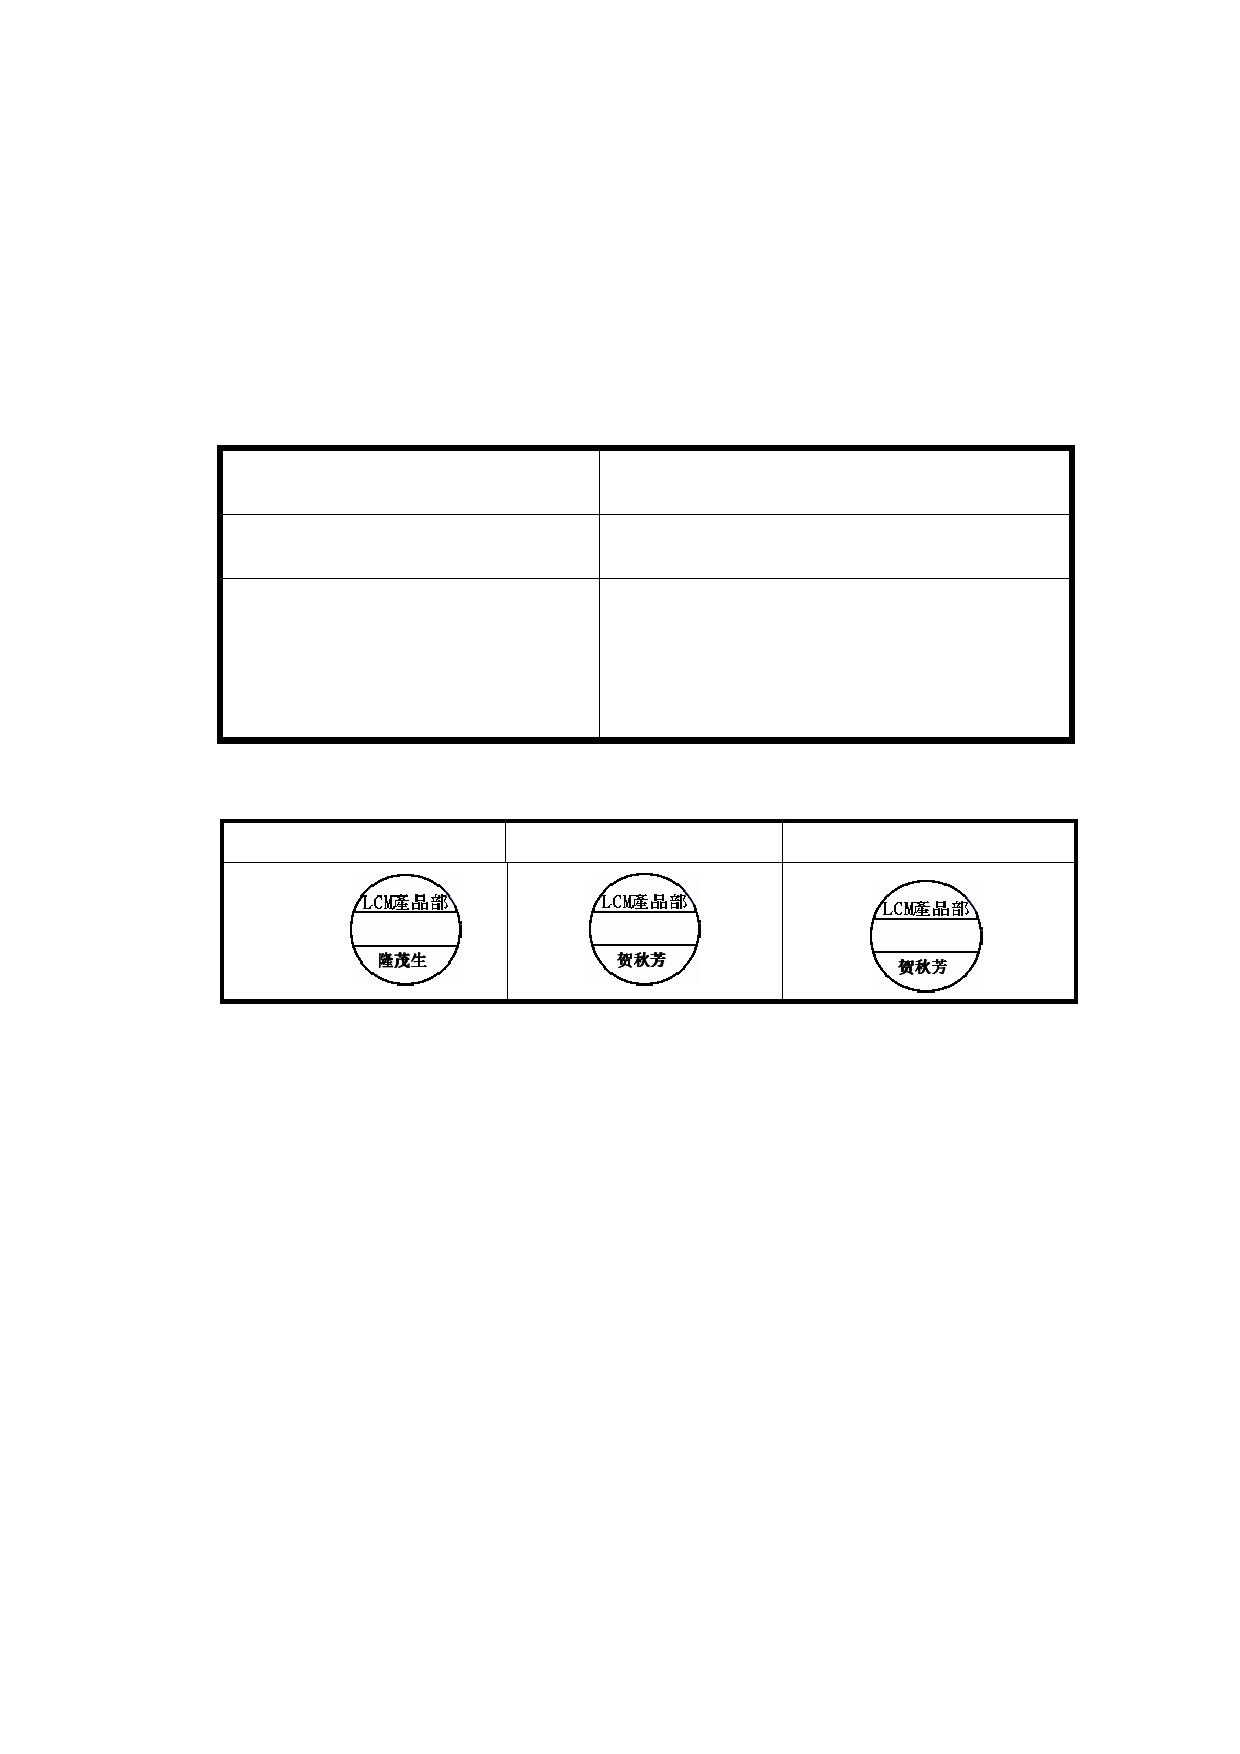 I2812-7IPT2432A Hoja de datos, Descripción, Manual